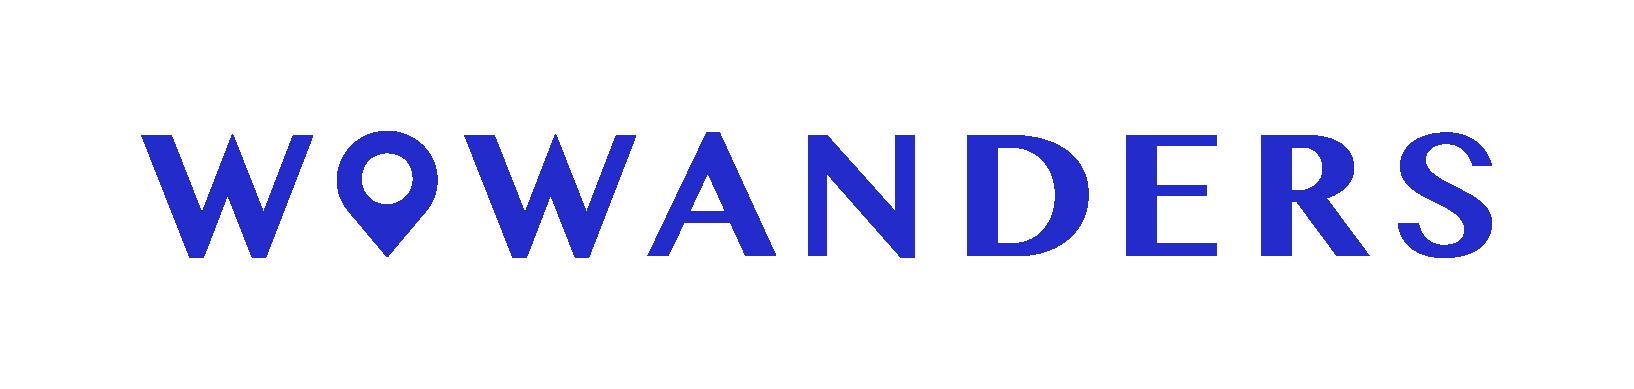 wowanders_logo_rgb.png